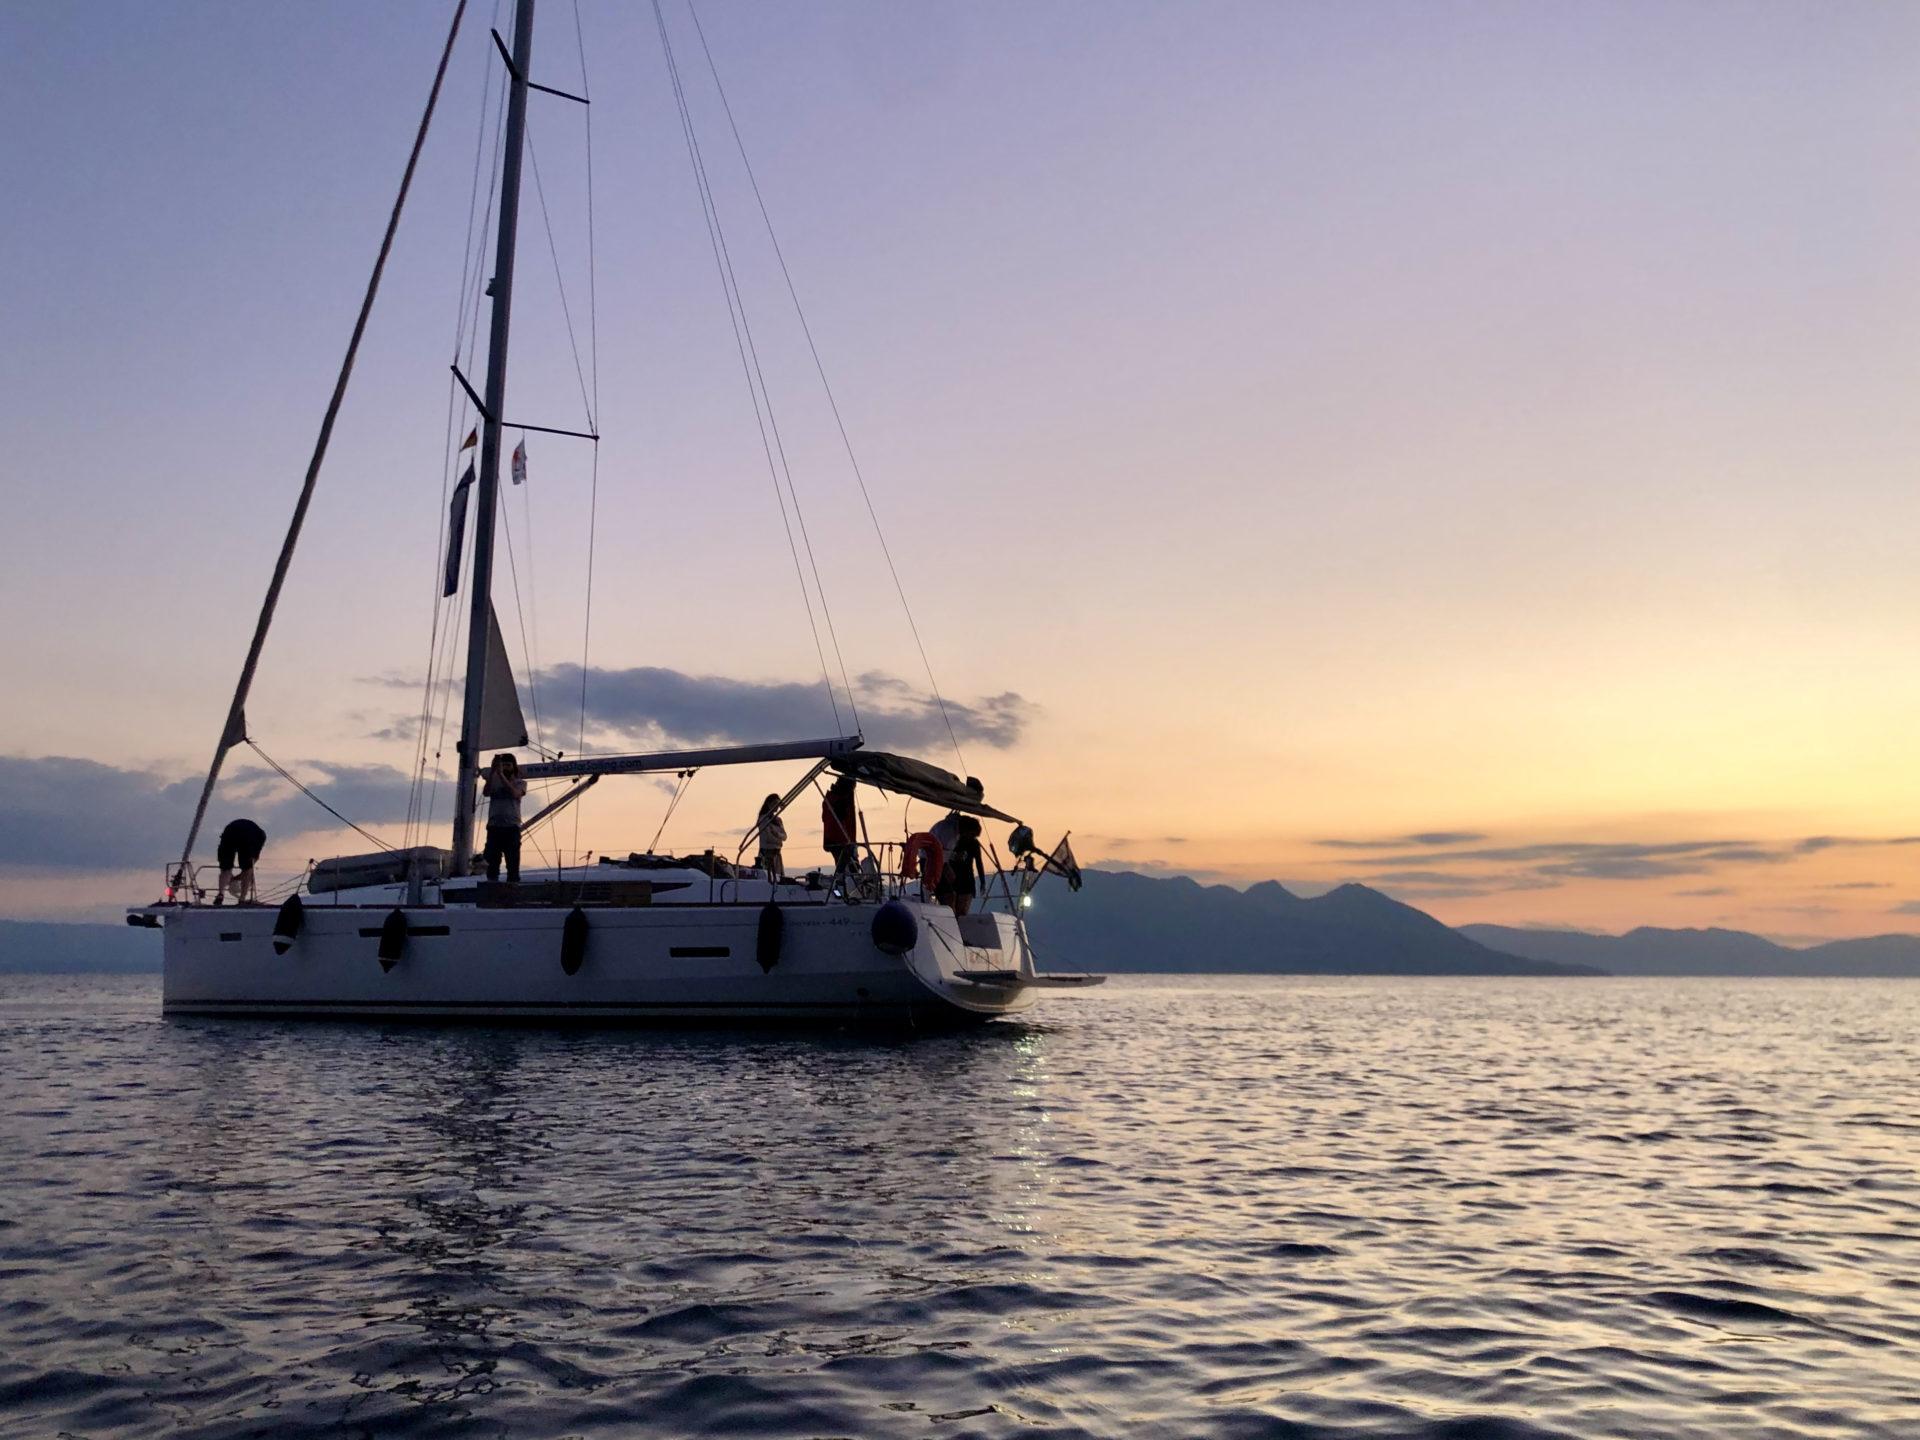 Sebastians Urlaubsboot beim Skippertraining